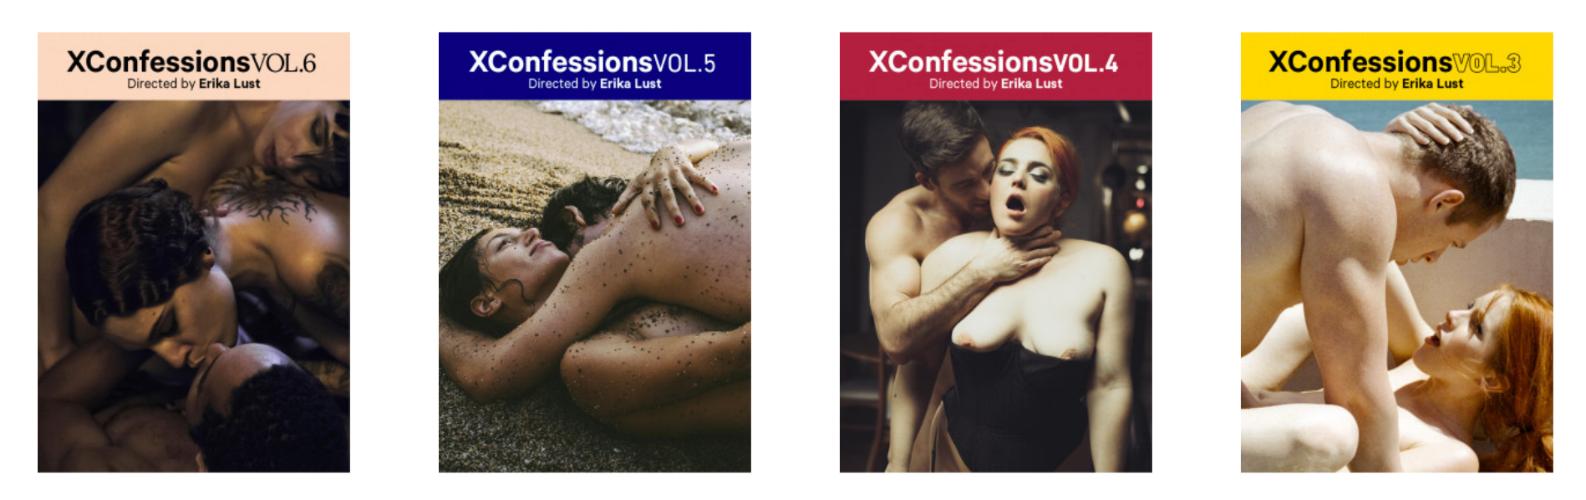 Erika Lust , XConfessions, 1-year membership,  $99.95